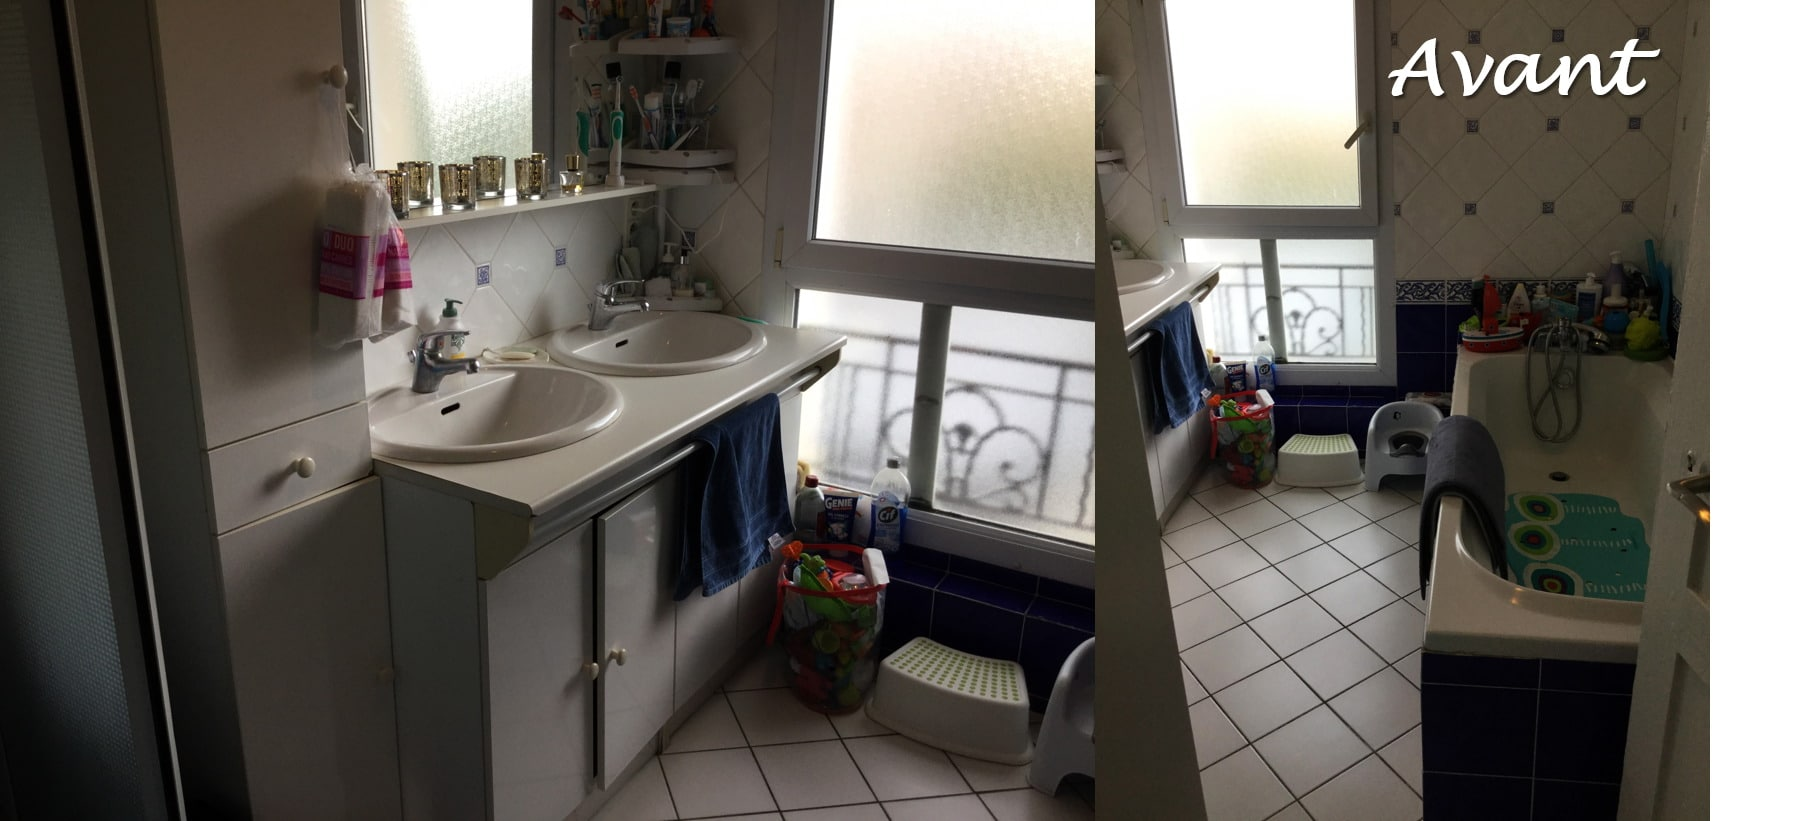 Photo avant salle de bain 2